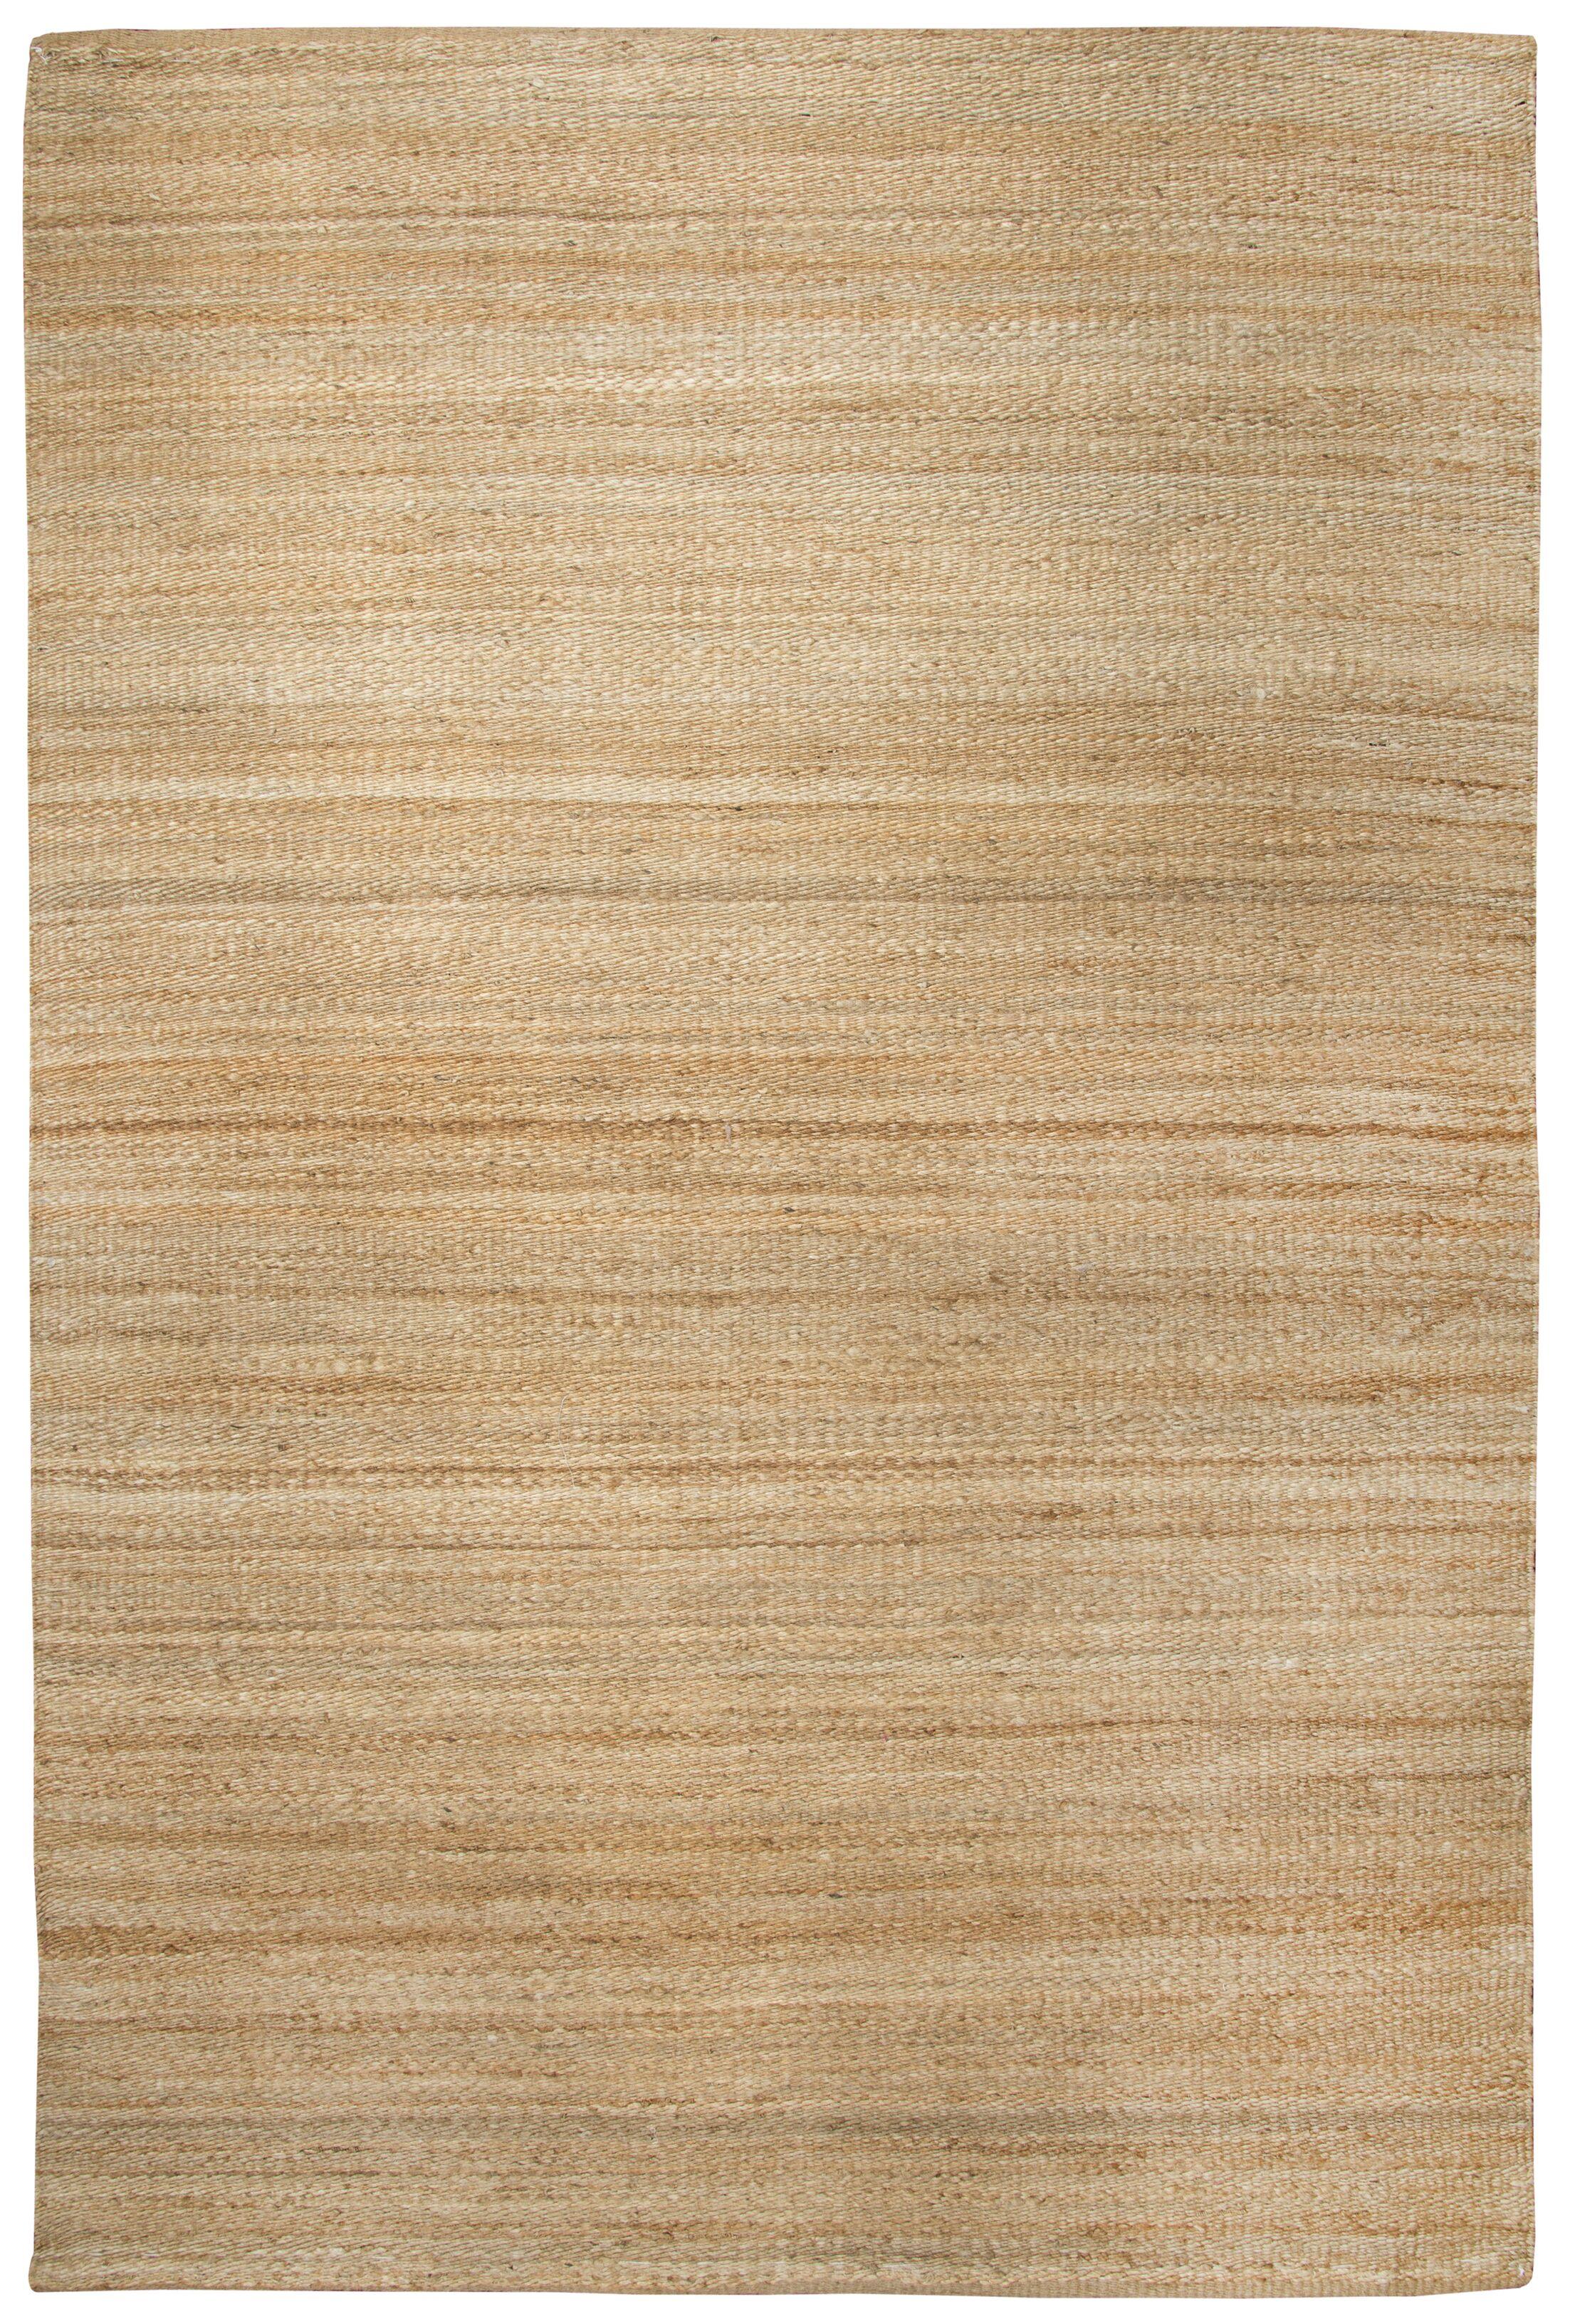 Dalveen Hand Woven Natural Area Rug Rug Size: Rectangle 5' x 7'